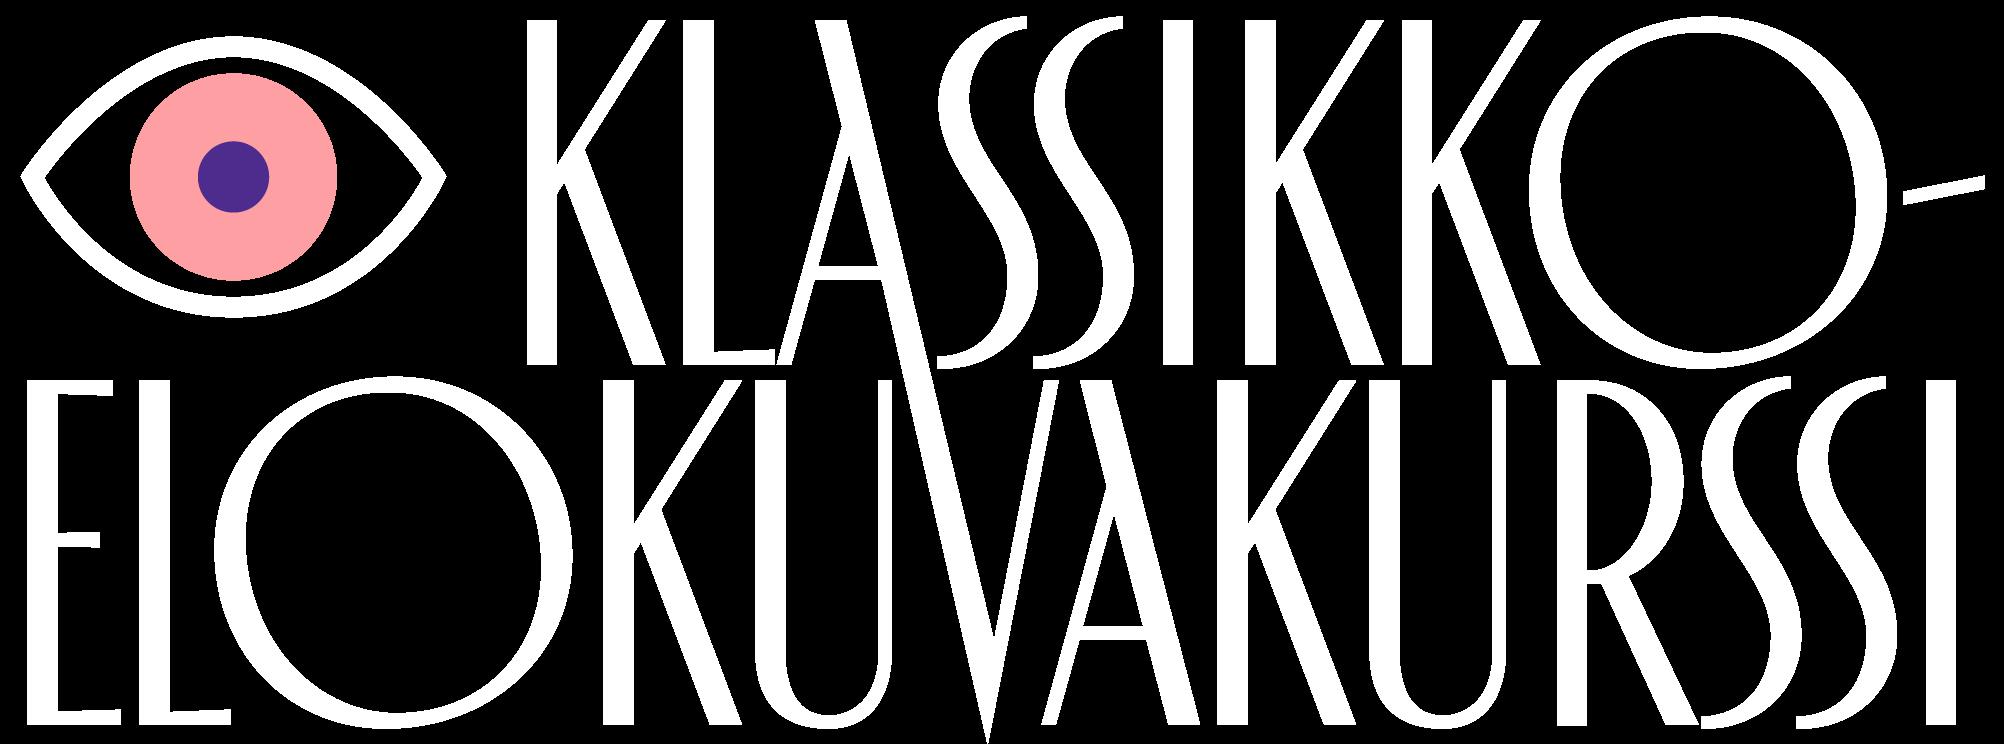 Klassikkoelokuvakurssin logo